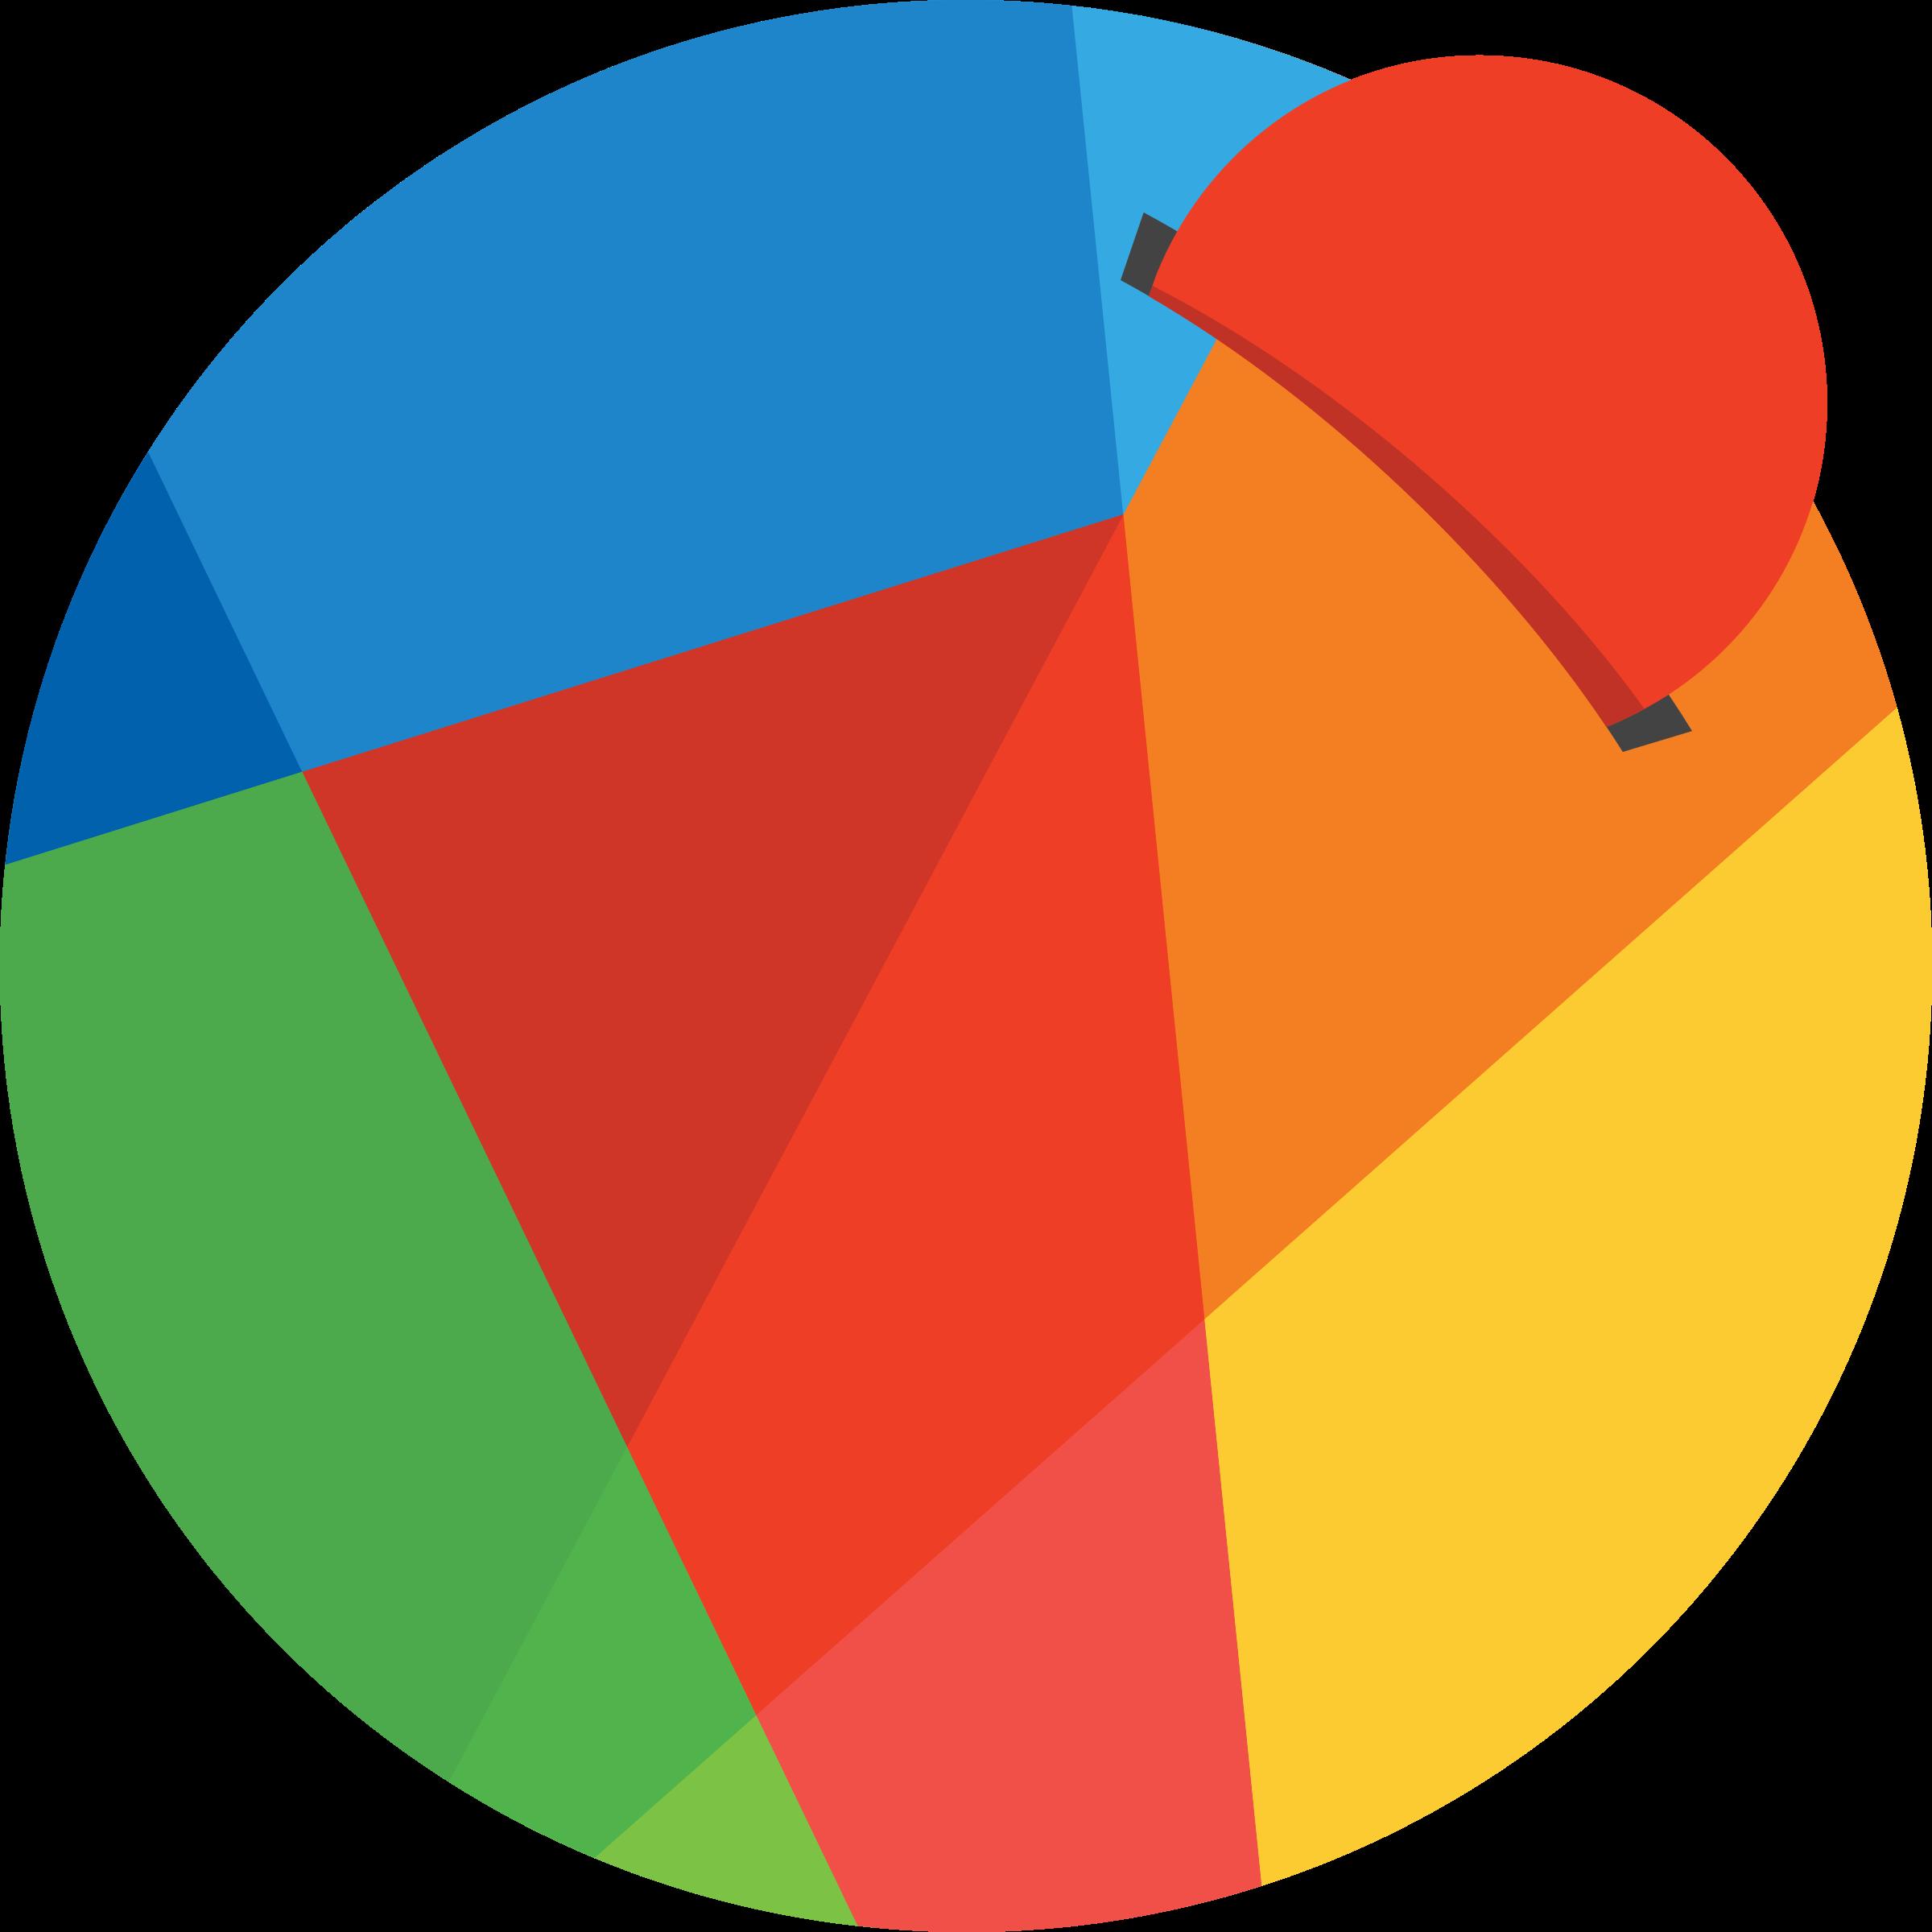 Reddcoin logo png transparent. Coin clipart vector